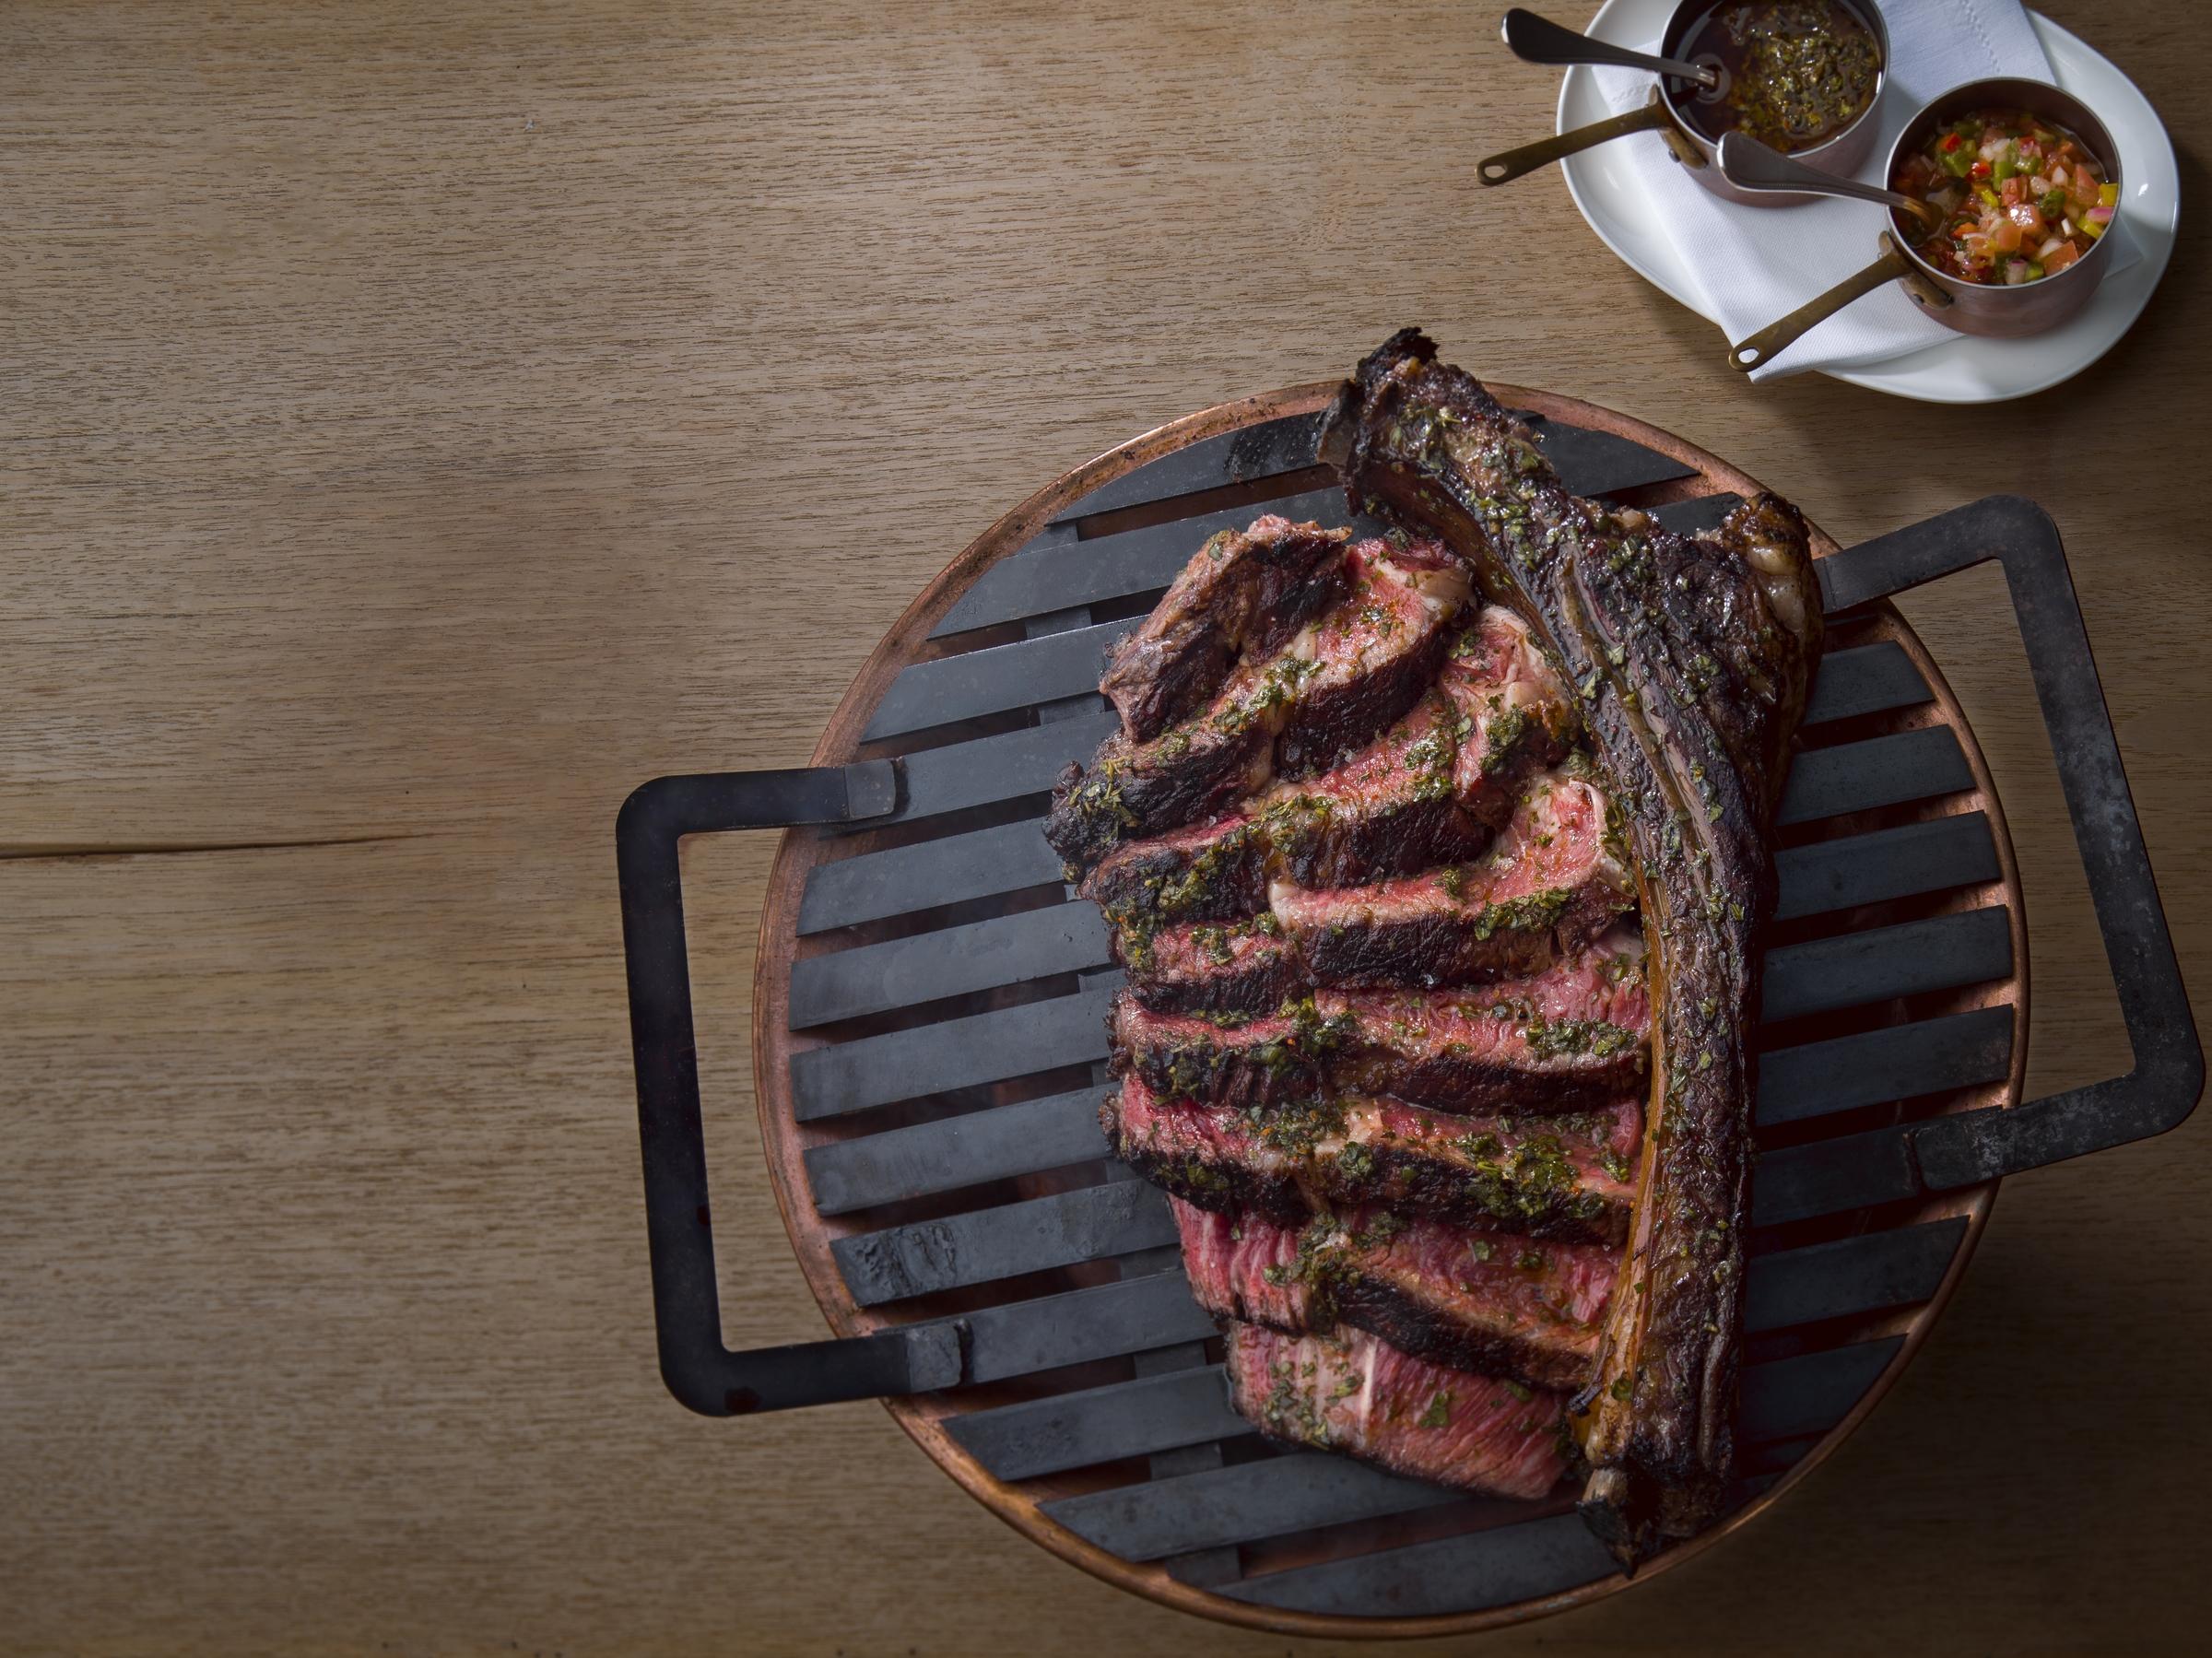 Los Fuegos_oz. 'Hanging' Tomahawk Steak_Photo by Juan Fernando Ayora.jpg